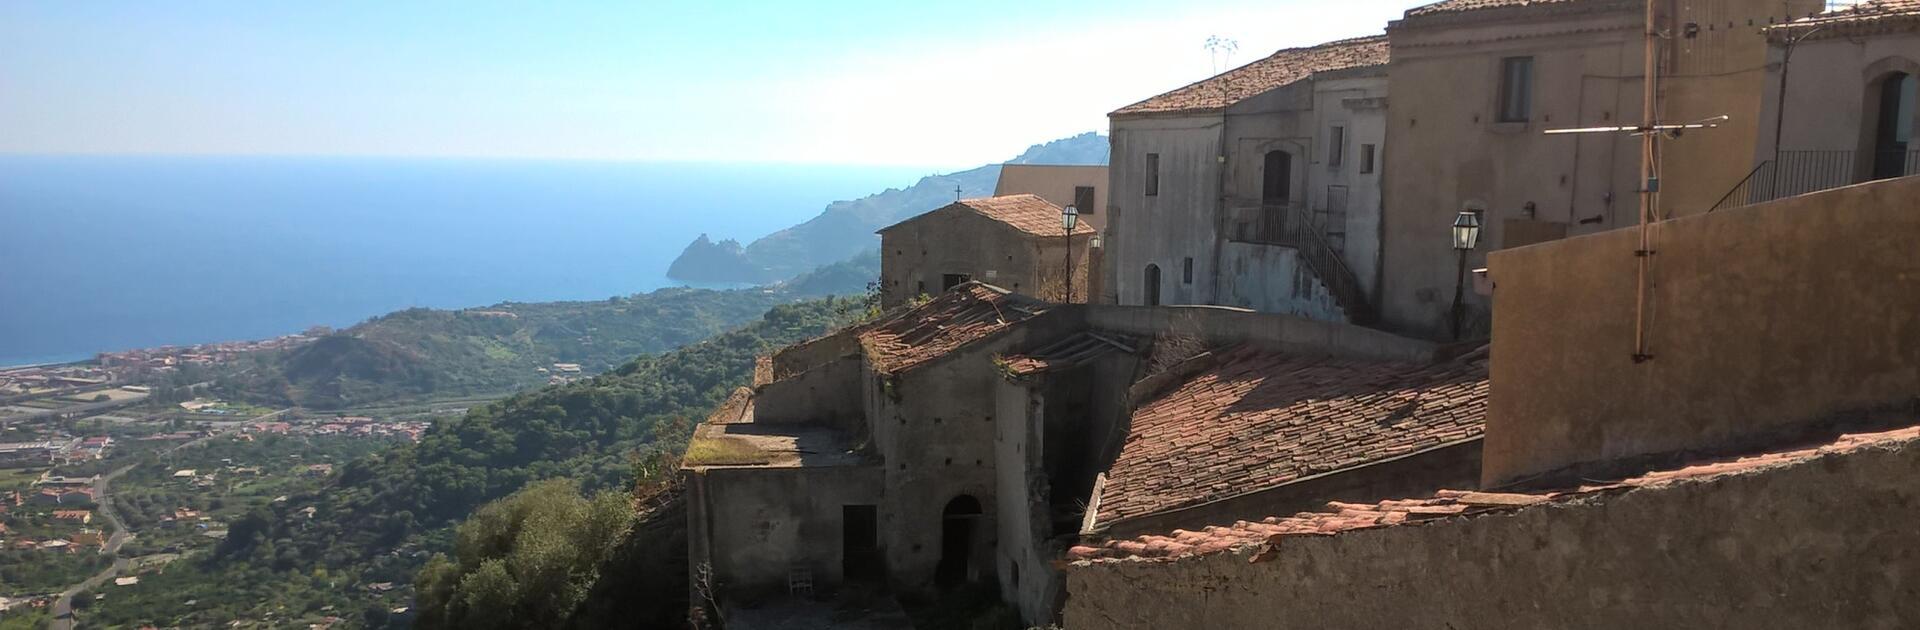 Savoca and Forza d'Agrò